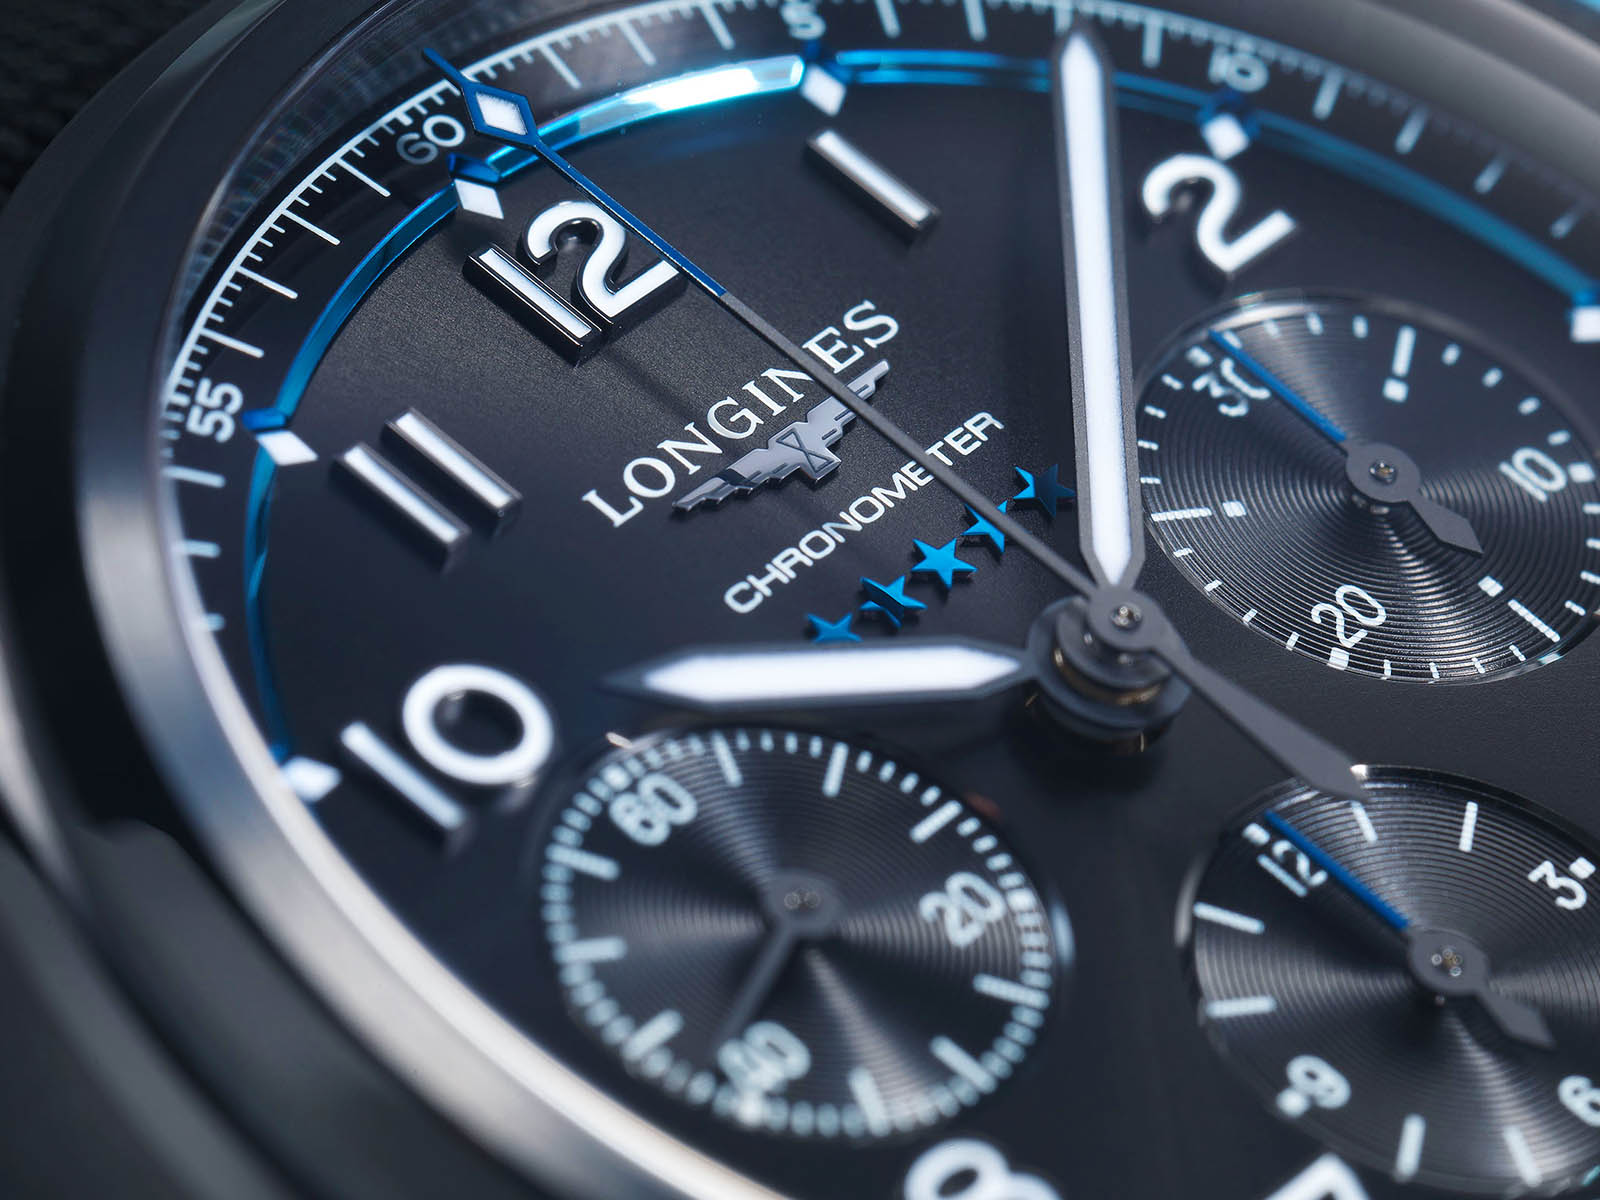 l3-829-2-99-2-longines-spirit-bucherer-blue-chronograph-2.jpg